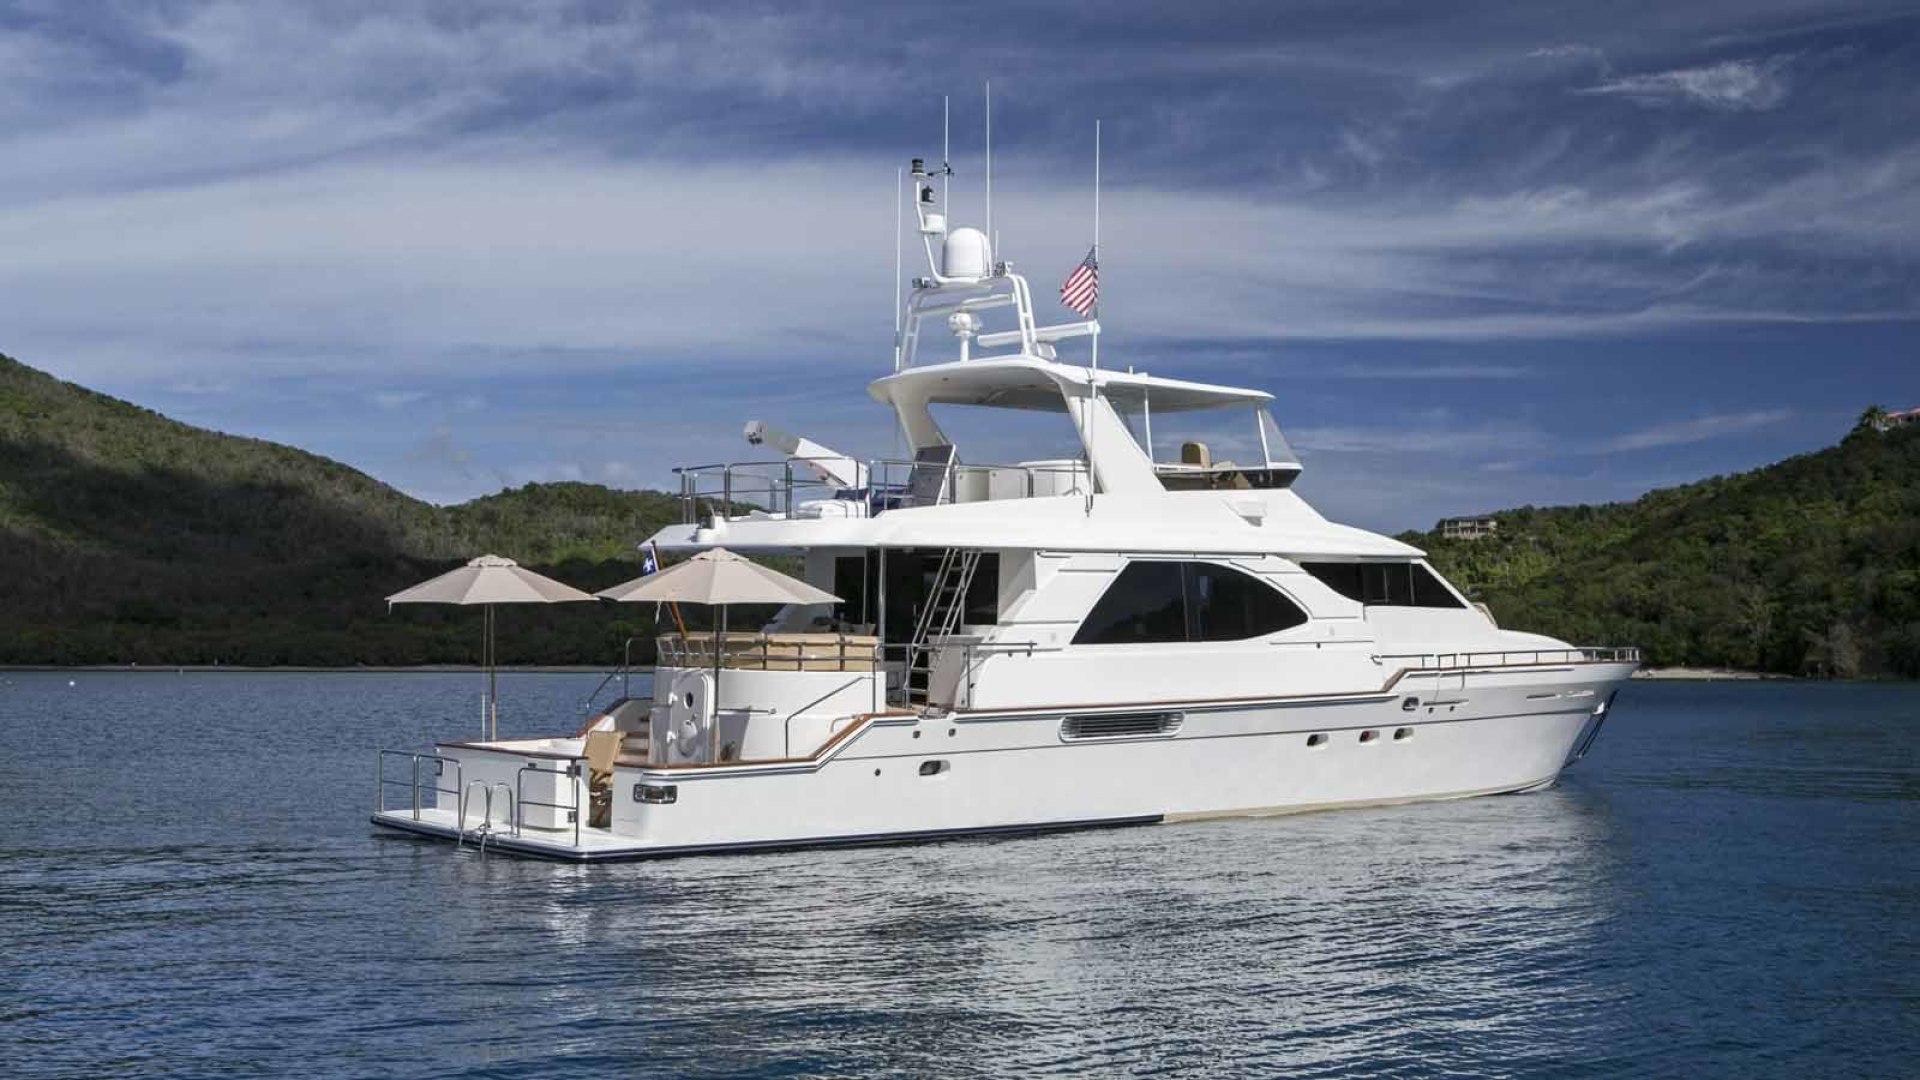 Queenship-Barretta 76 2004-SEA MYSTIC Fort Myers-Florida-United States-Stern Profile-1588171 | Thumbnail